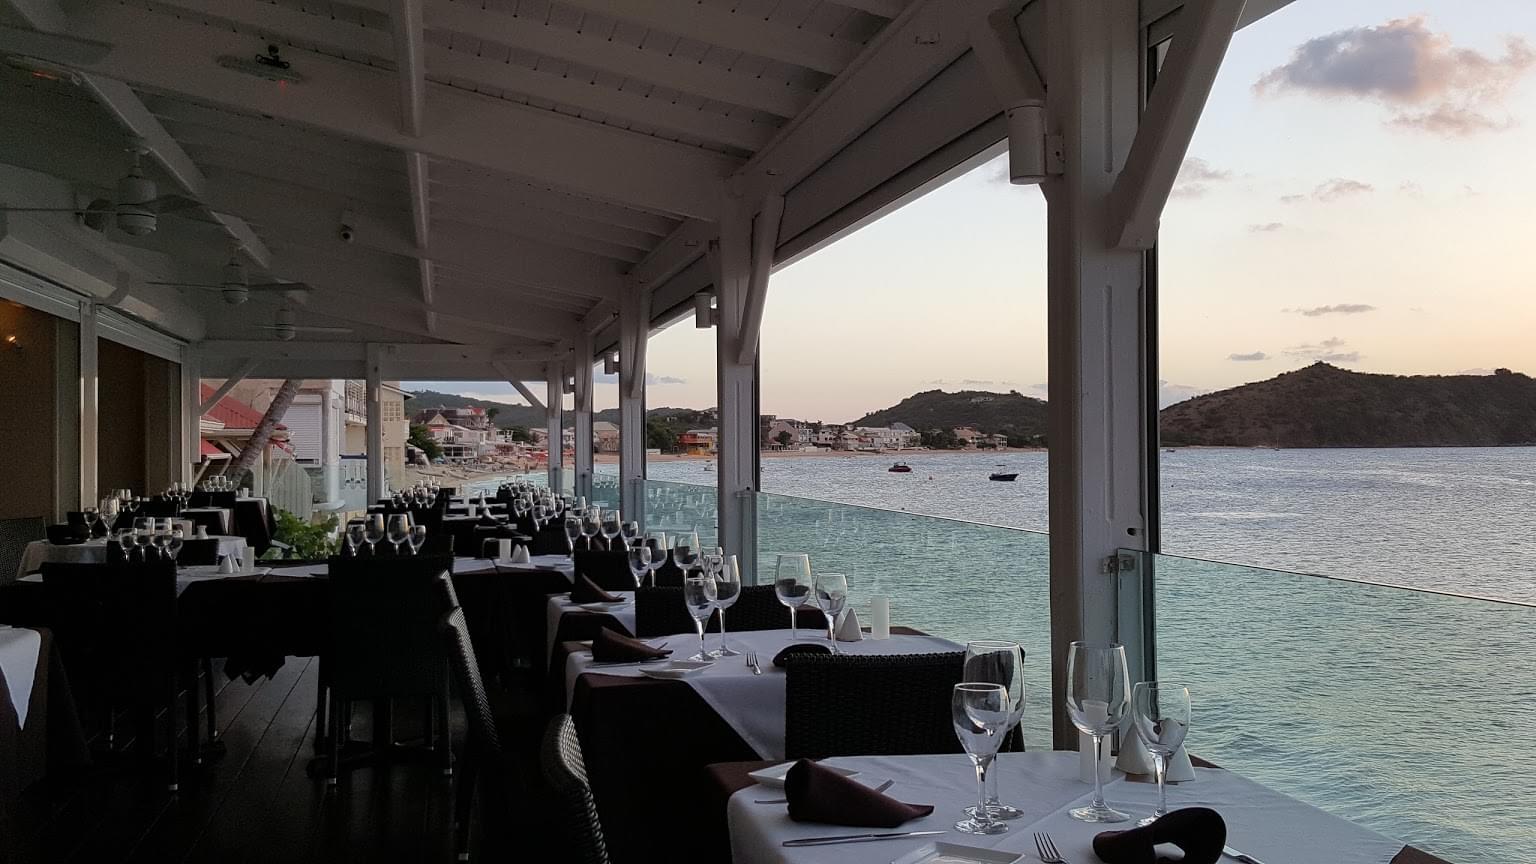 Ocean 82 grand case saint martin see inside restaurant google business view interactive - Restaurant boulevard saint martin ...